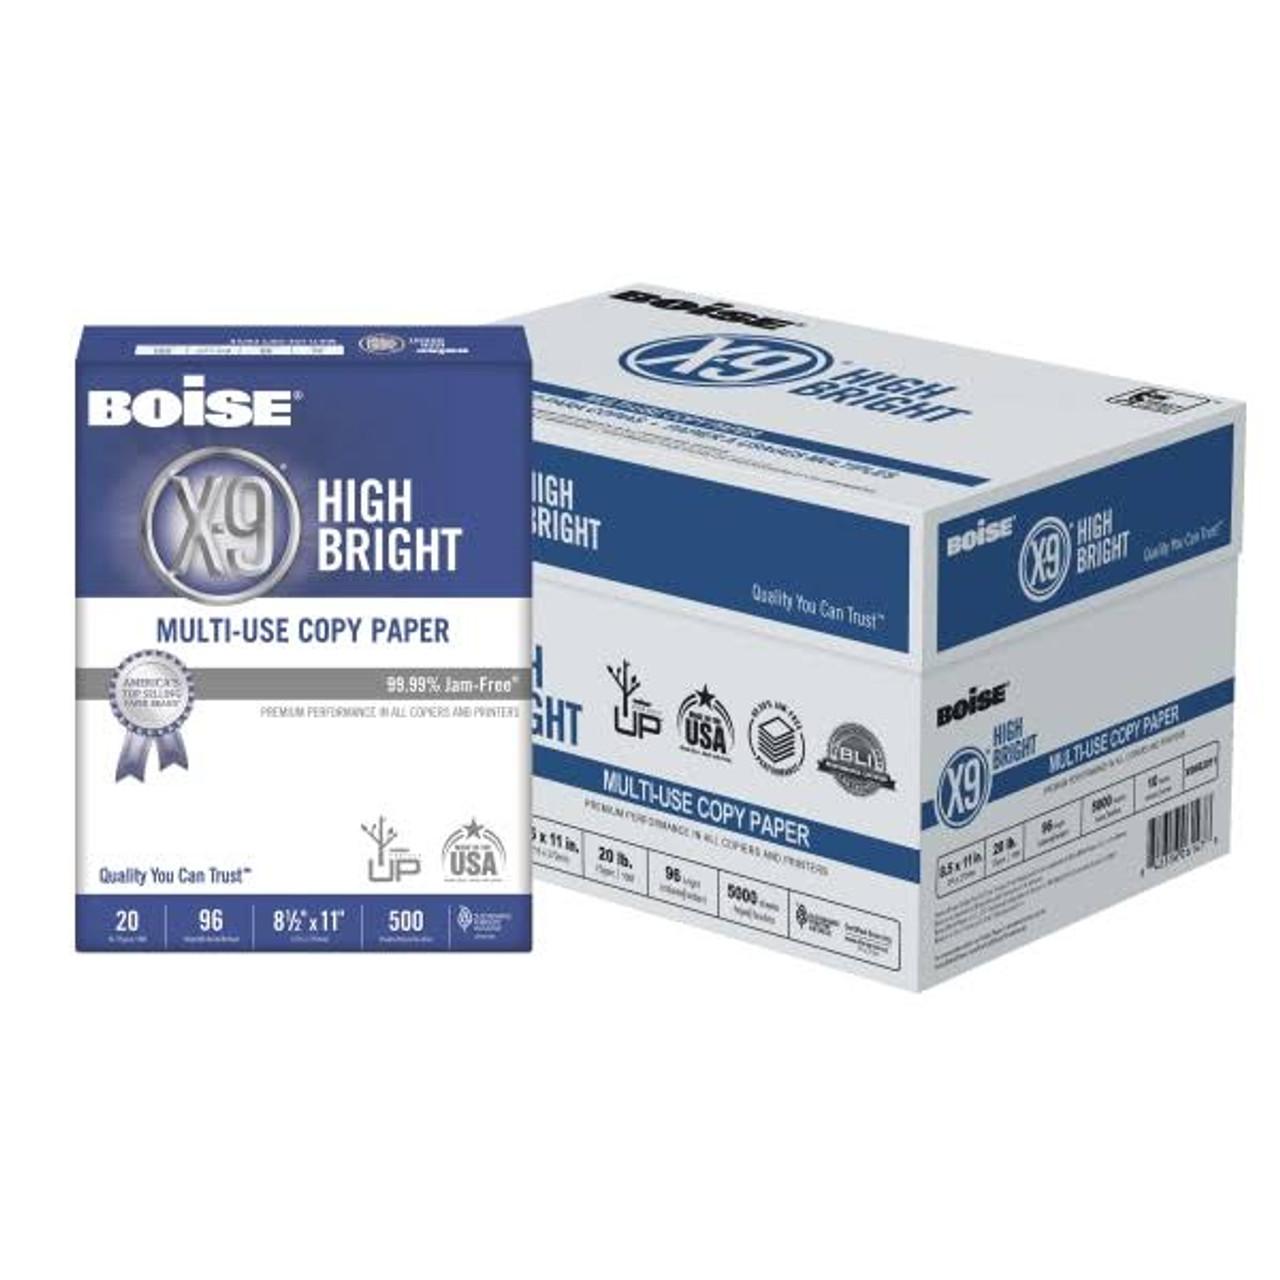 Boise X-9 High Bright White Multi-Use Printer Paper  - 10 Ream Case - 5000 sheets